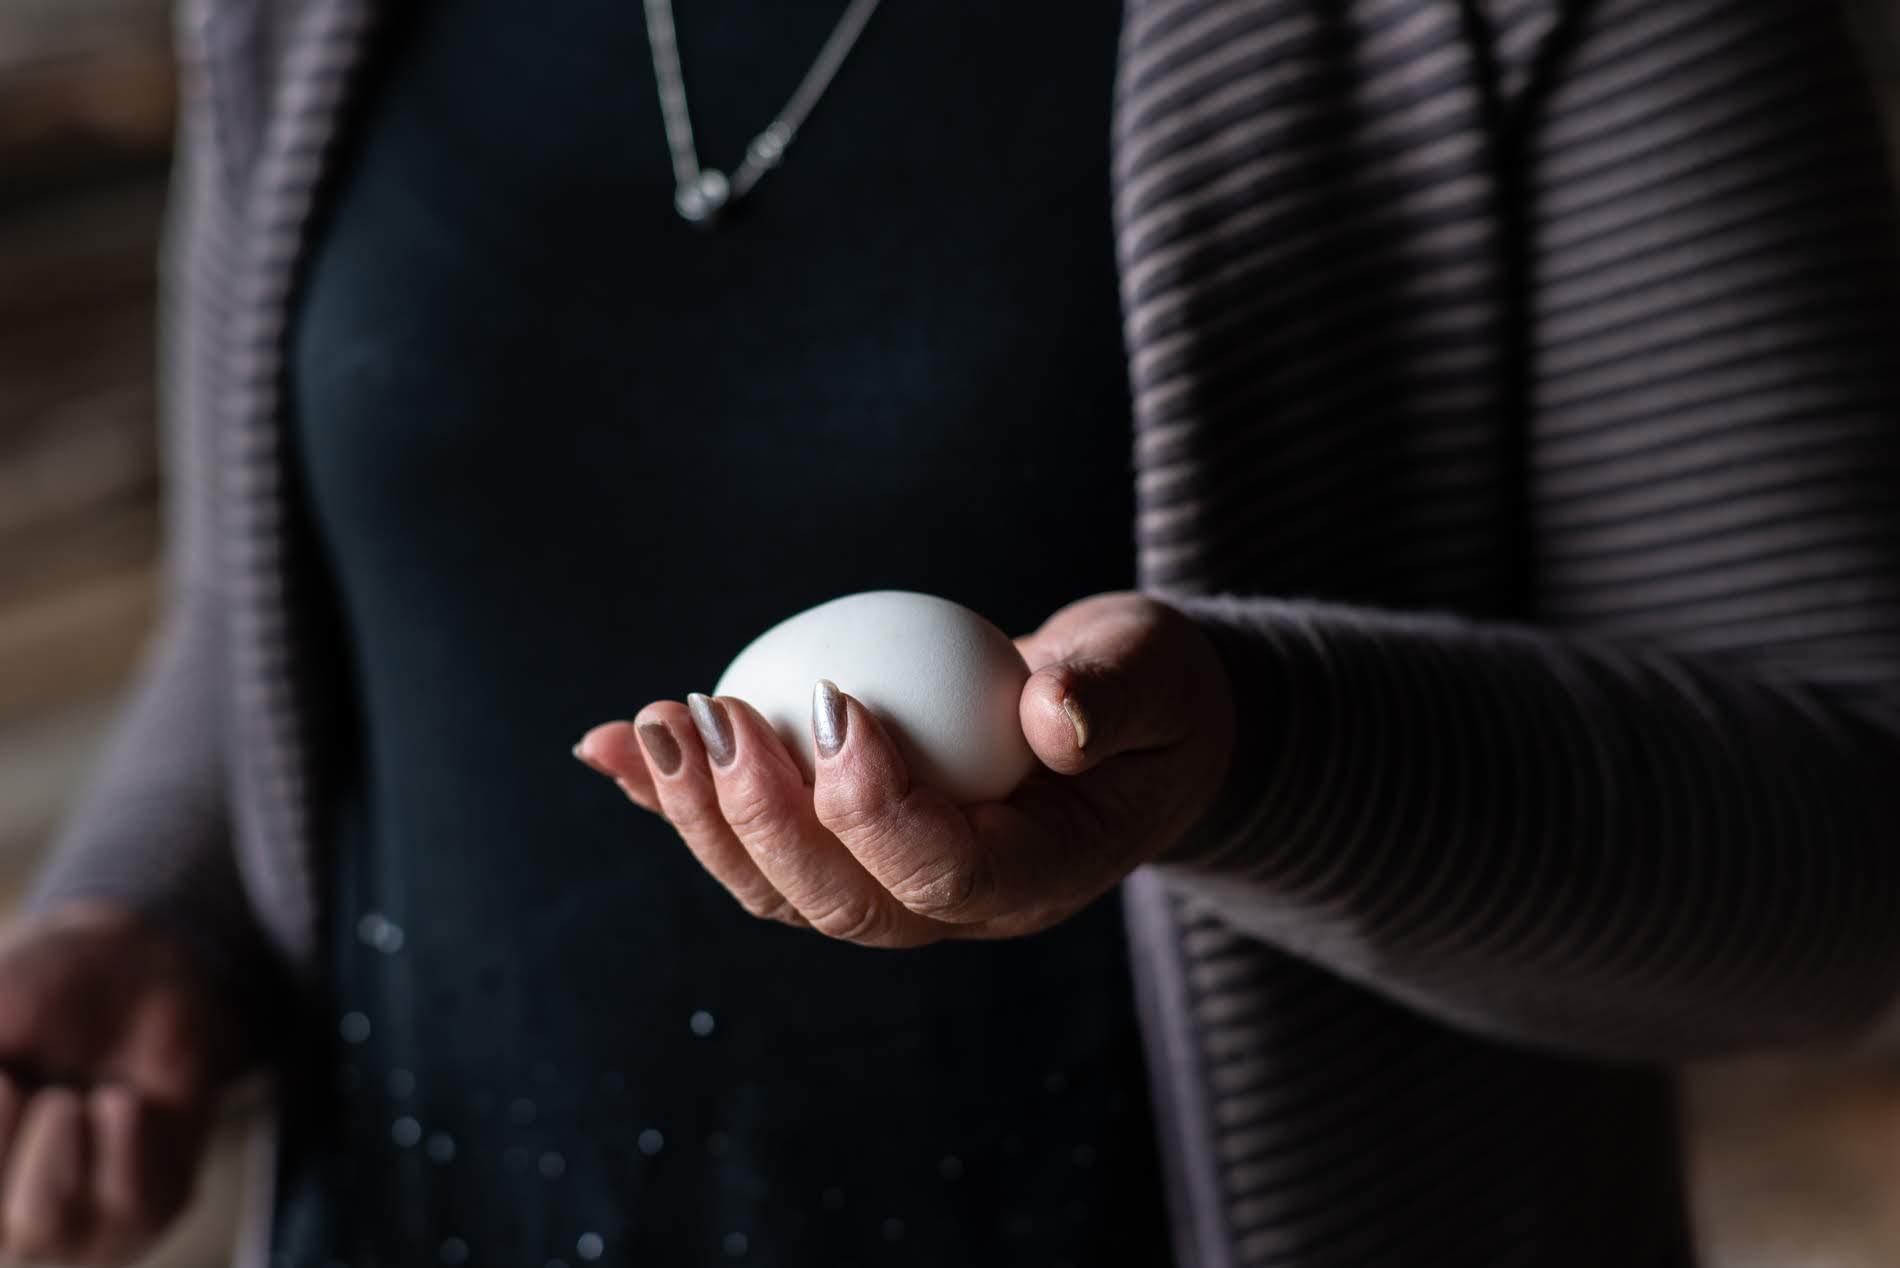 Нуну также разводит гусей. Фото: Тамуна Чкареули / OC Media